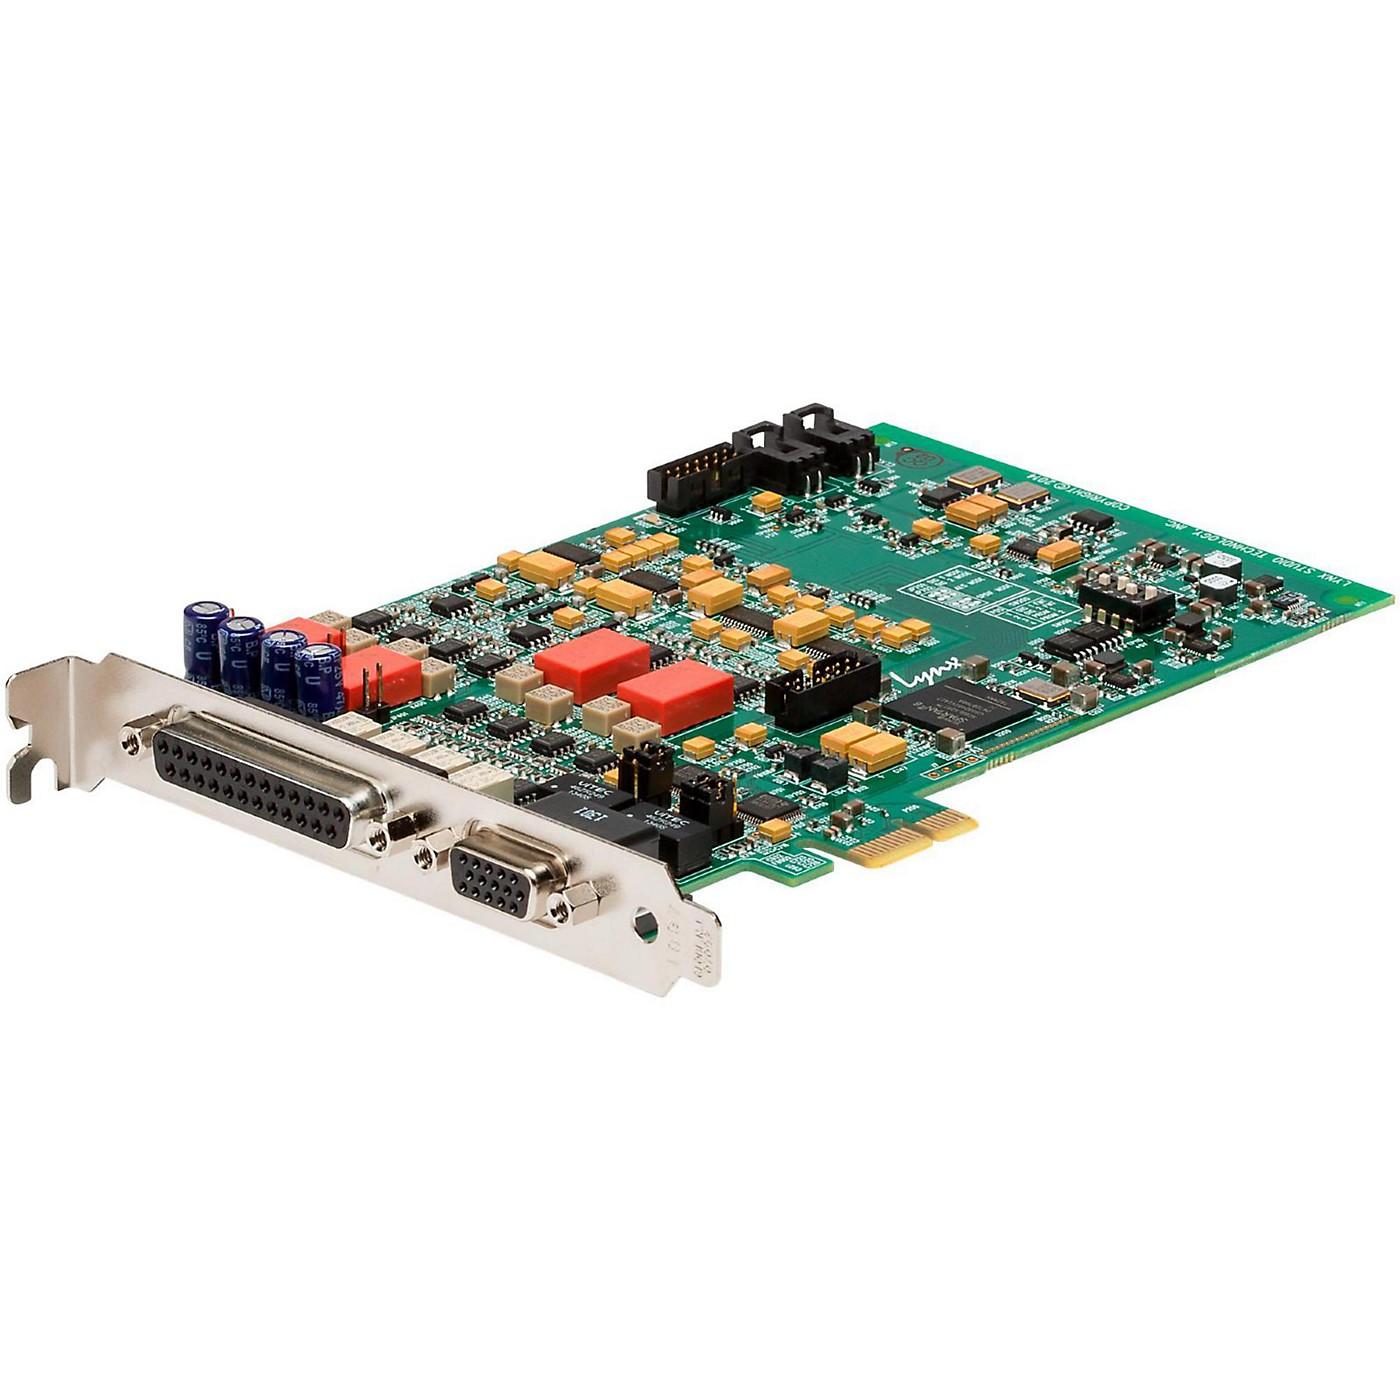 Lynx E44 4 Channel PCI Express Card thumbnail